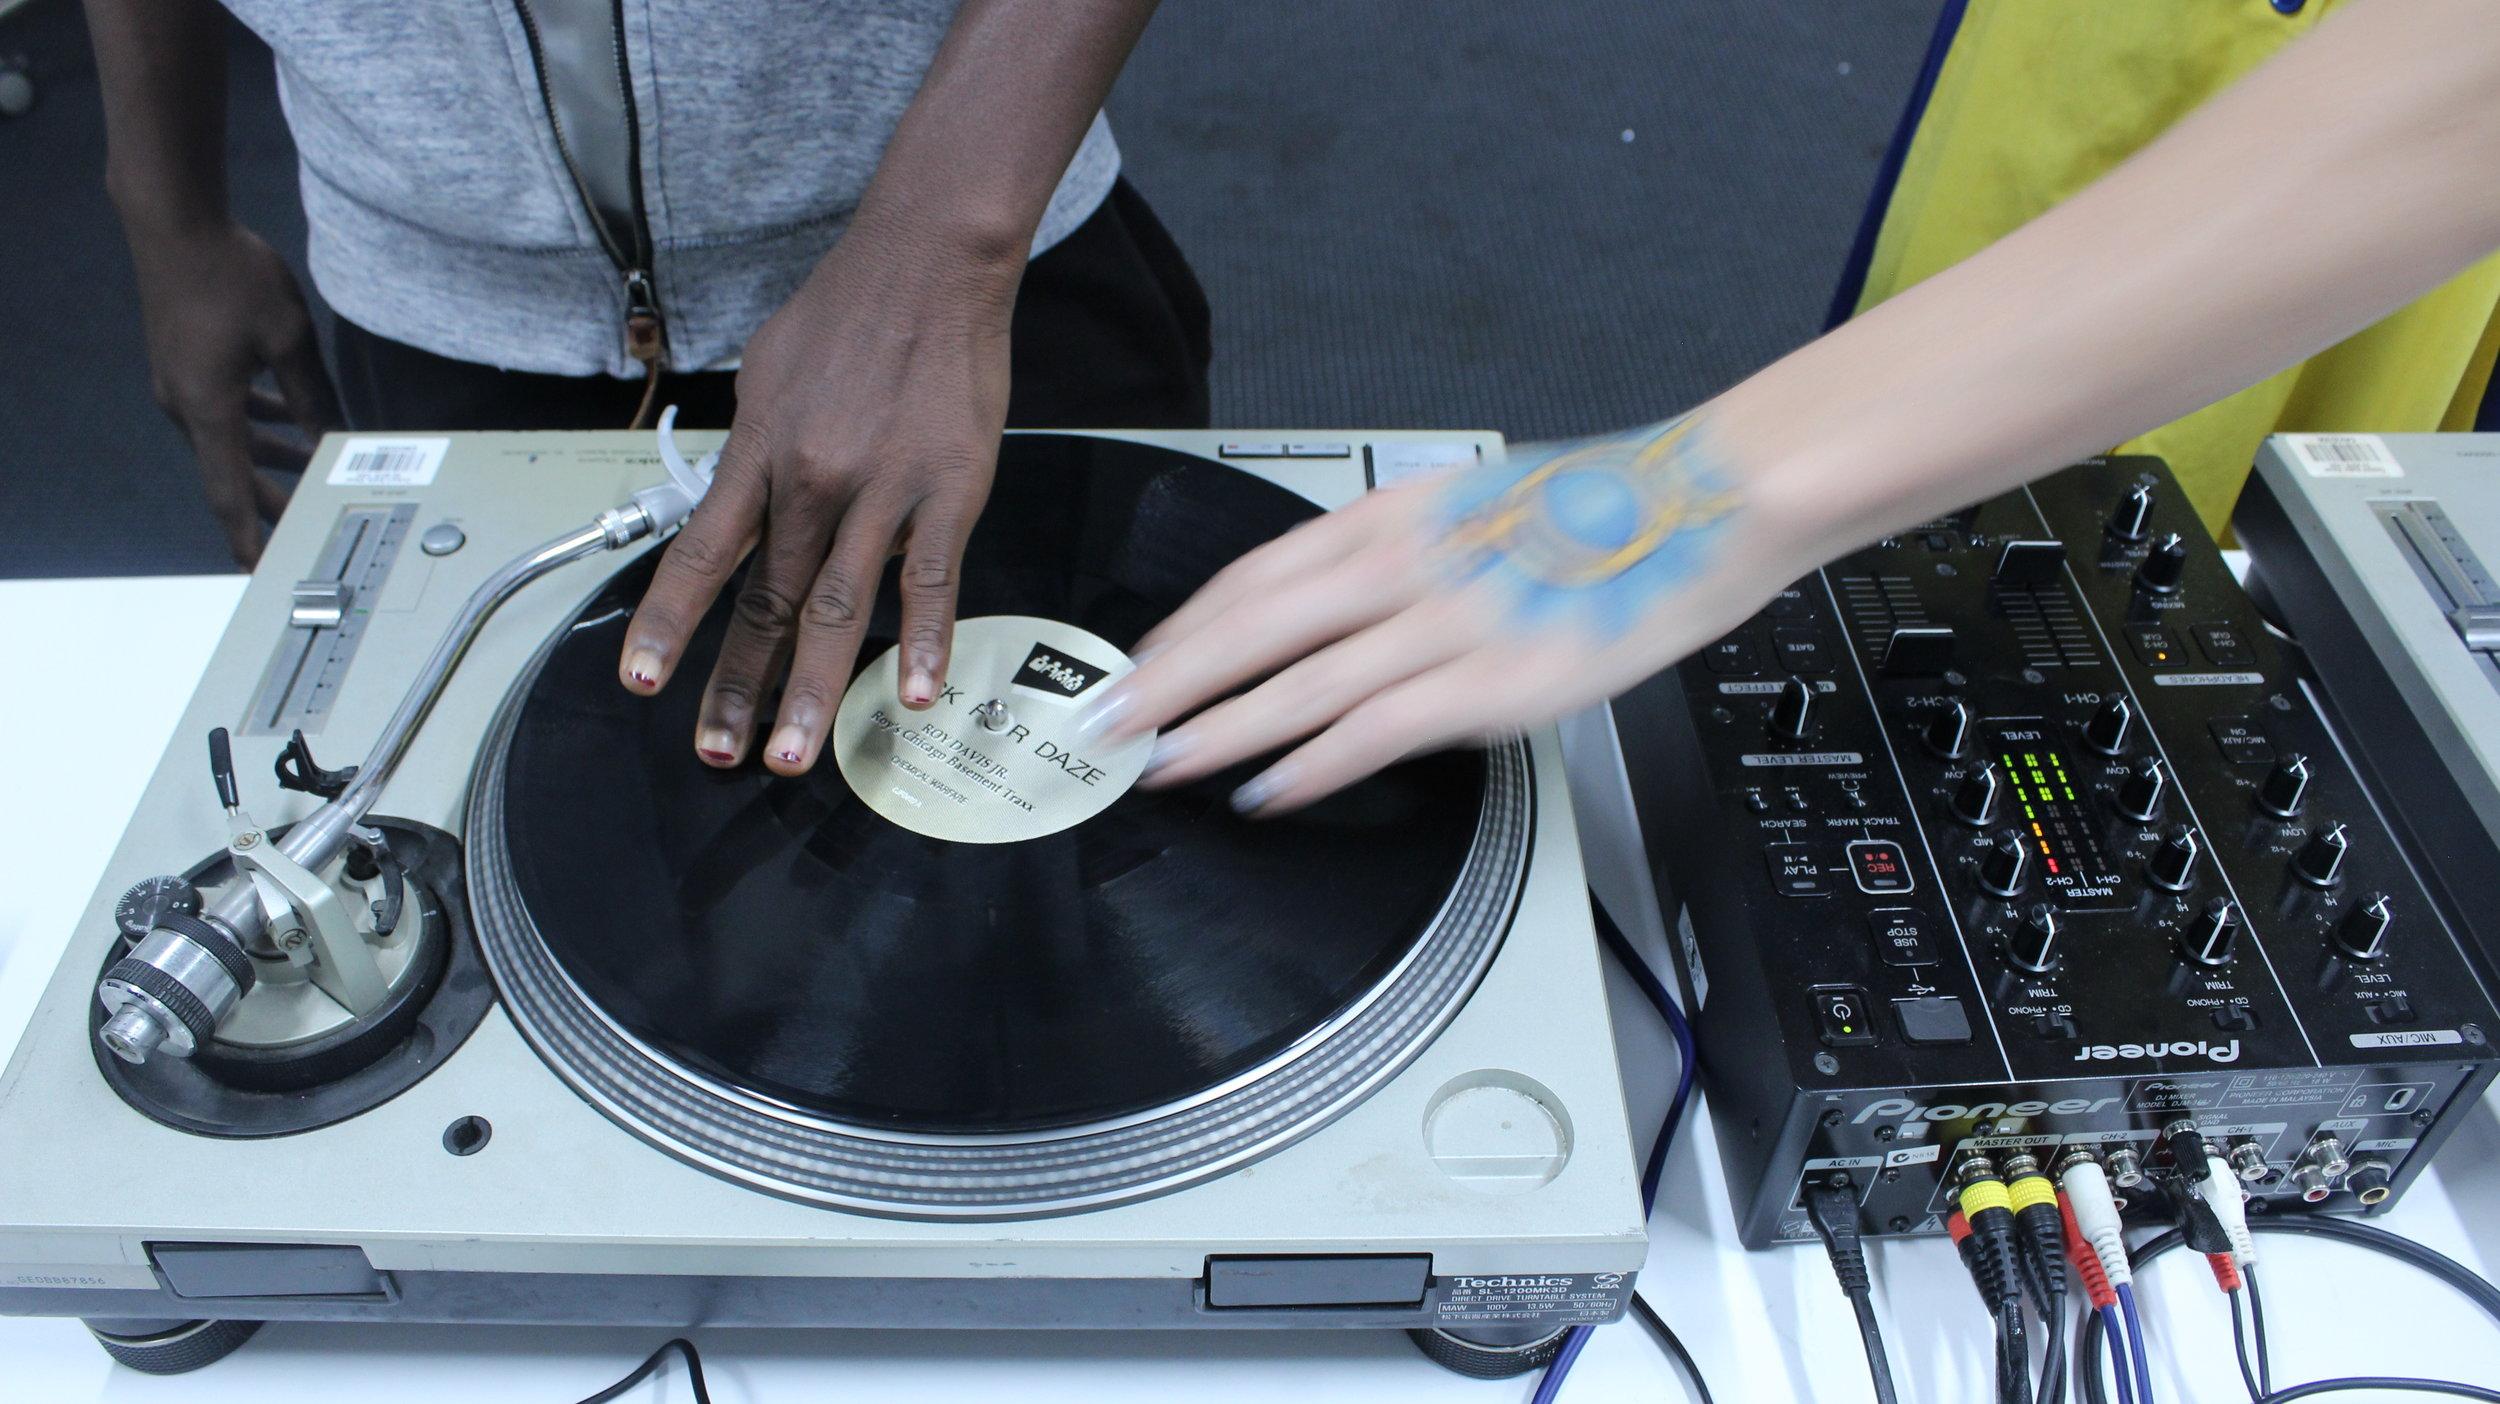 12/4/18: Brooke Powers: Vinyl DJing